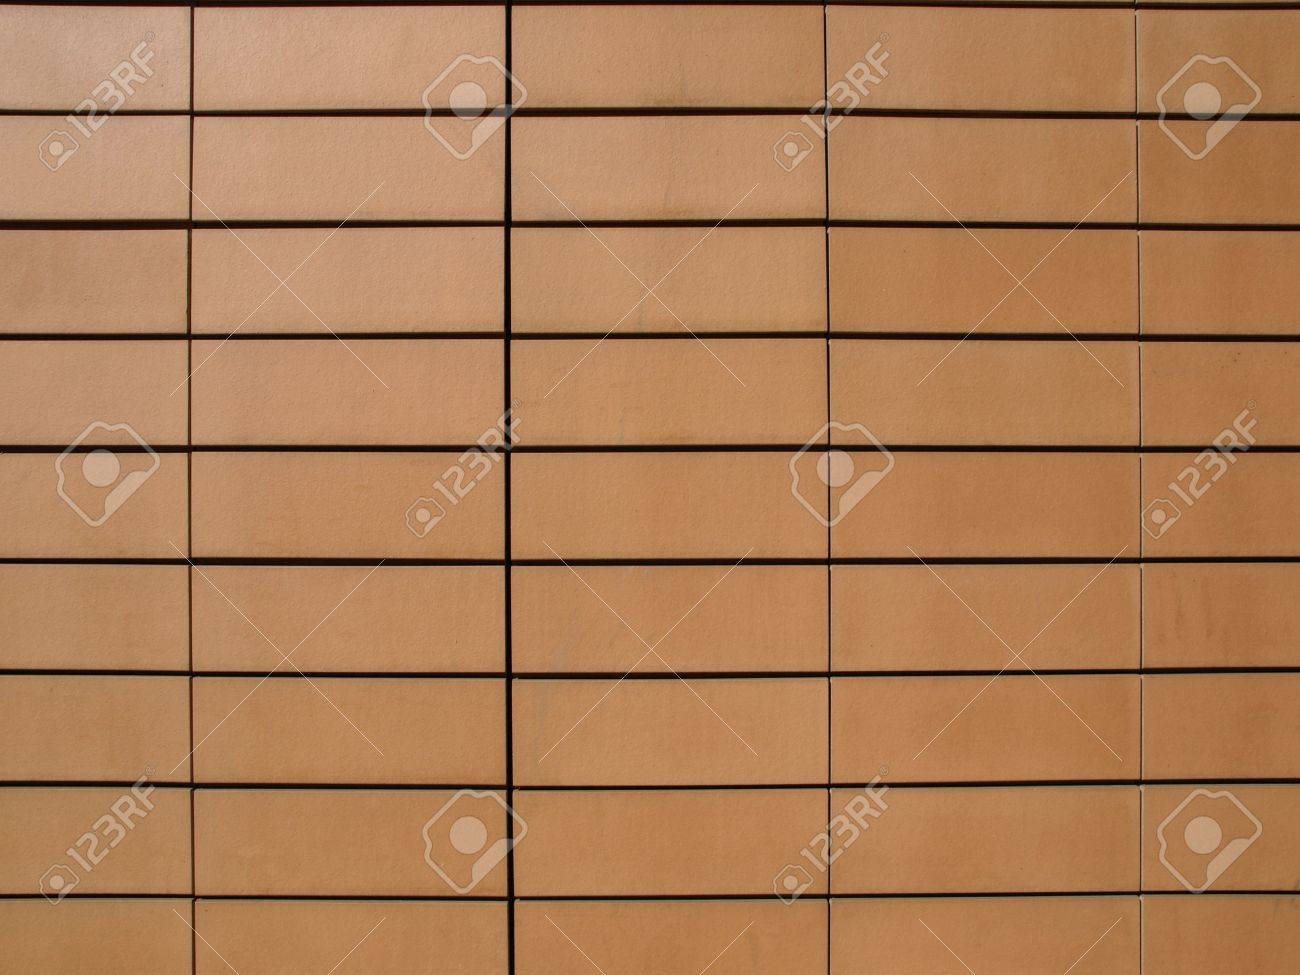 Orange ceramic terracotta tiles as a wall cladding stock photo orange ceramic terracotta tiles as a wall cladding stock photo 5877897 dailygadgetfo Choice Image